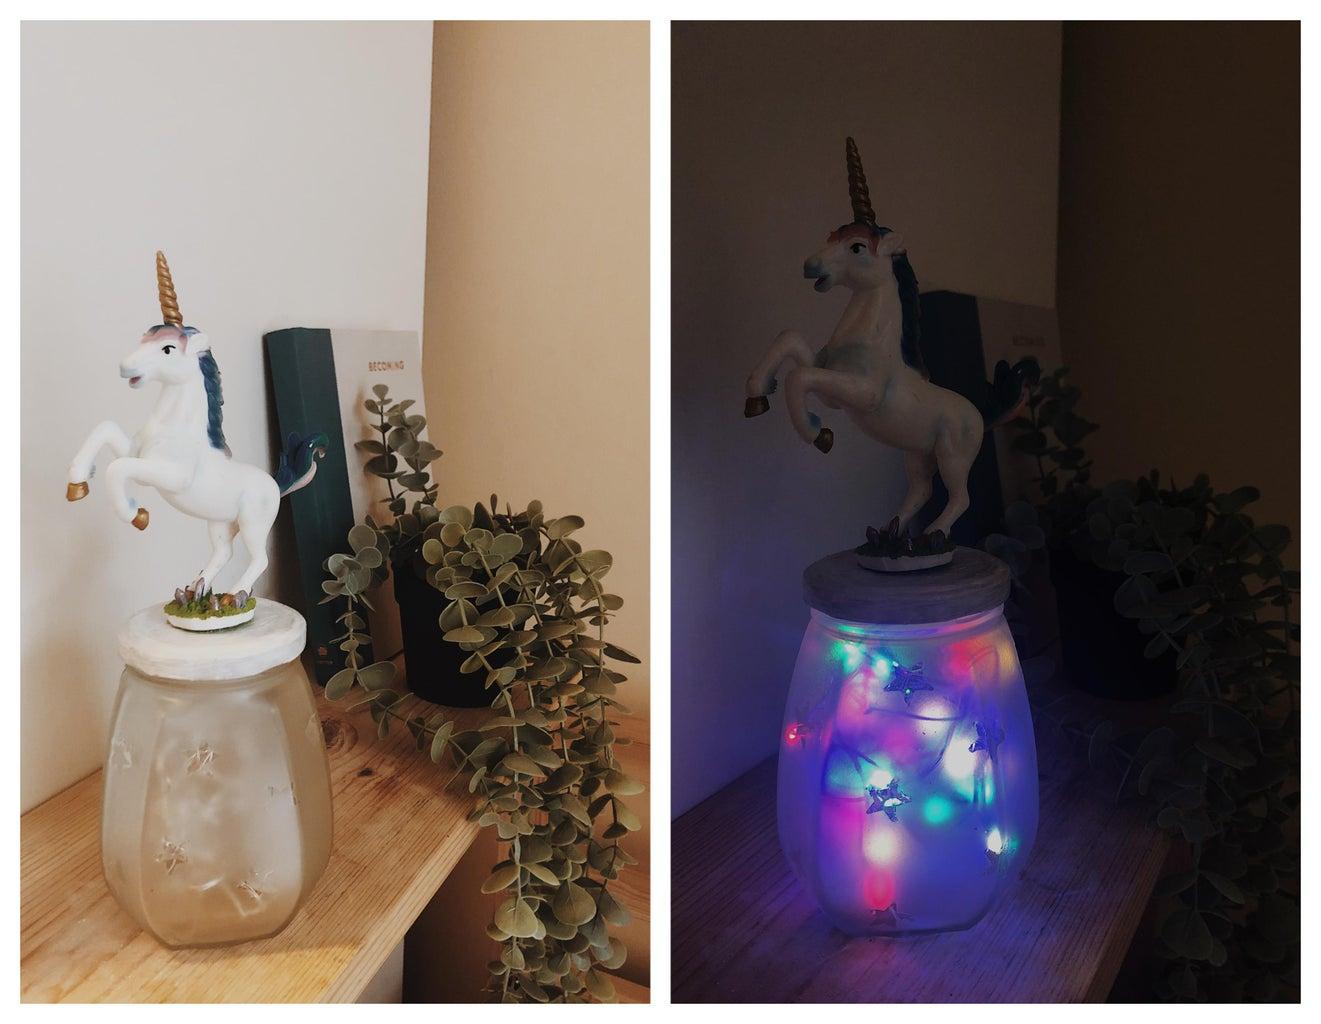 Mesmerising Glass Jar Night Light for Your Superhero Kid!